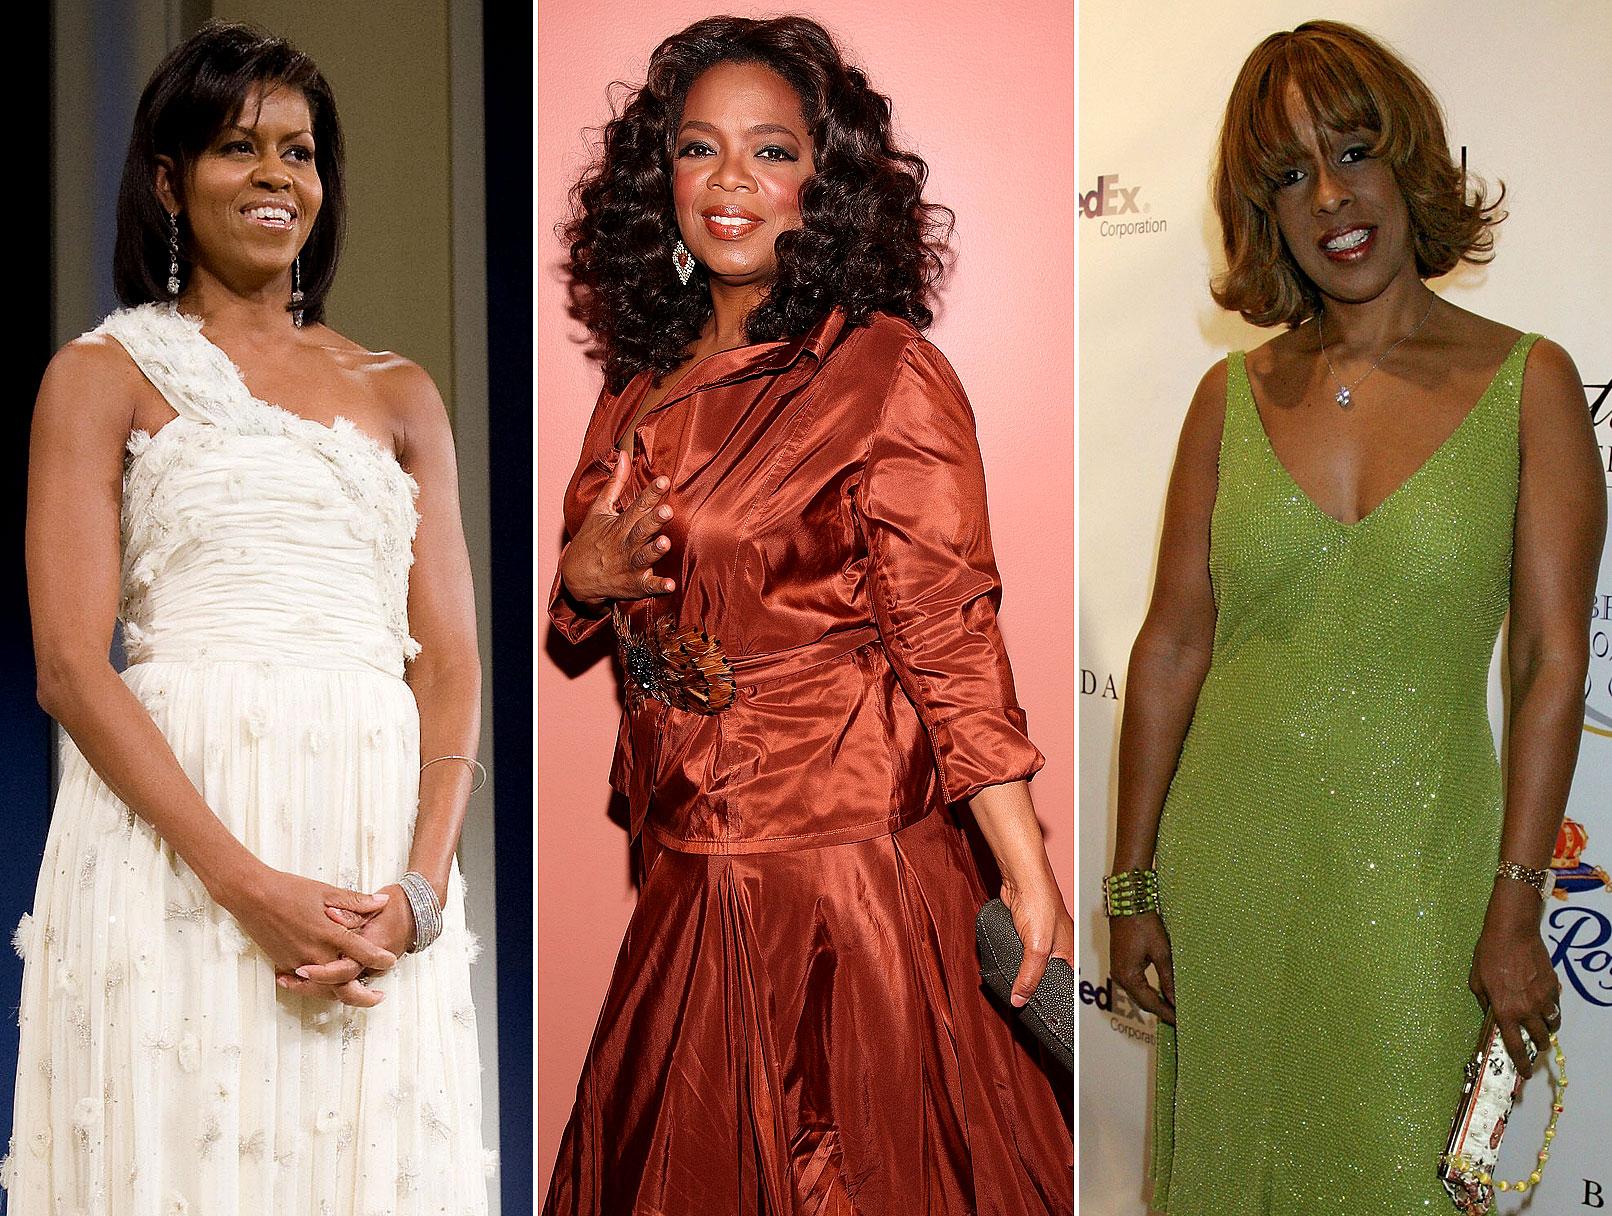 Oprah & Gayle Visit Michelle Obama